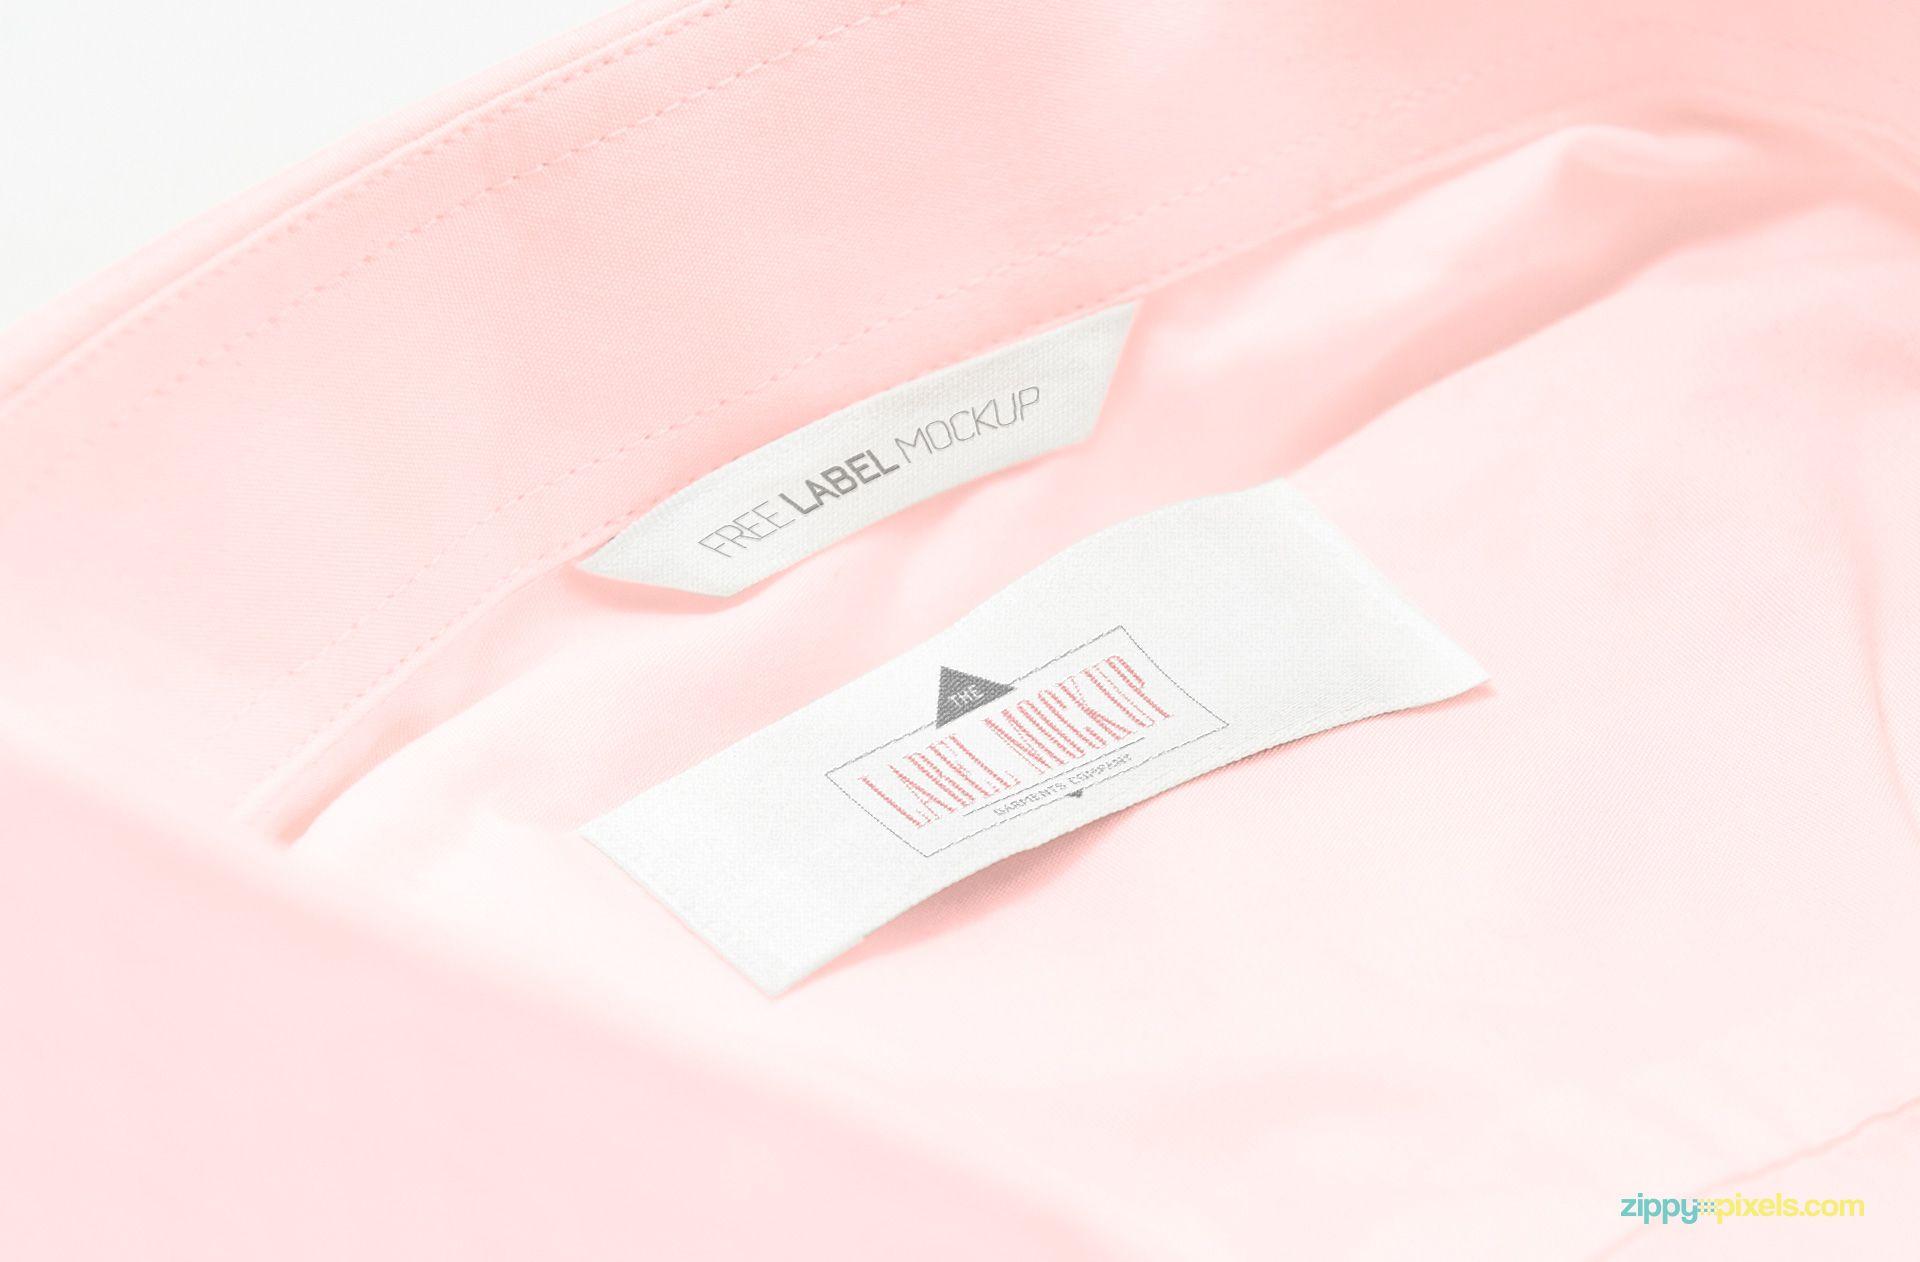 Download 2 Free Clothing Label Mockups Zippypixels Clothing Mockup Clothing Labels Free Clothes